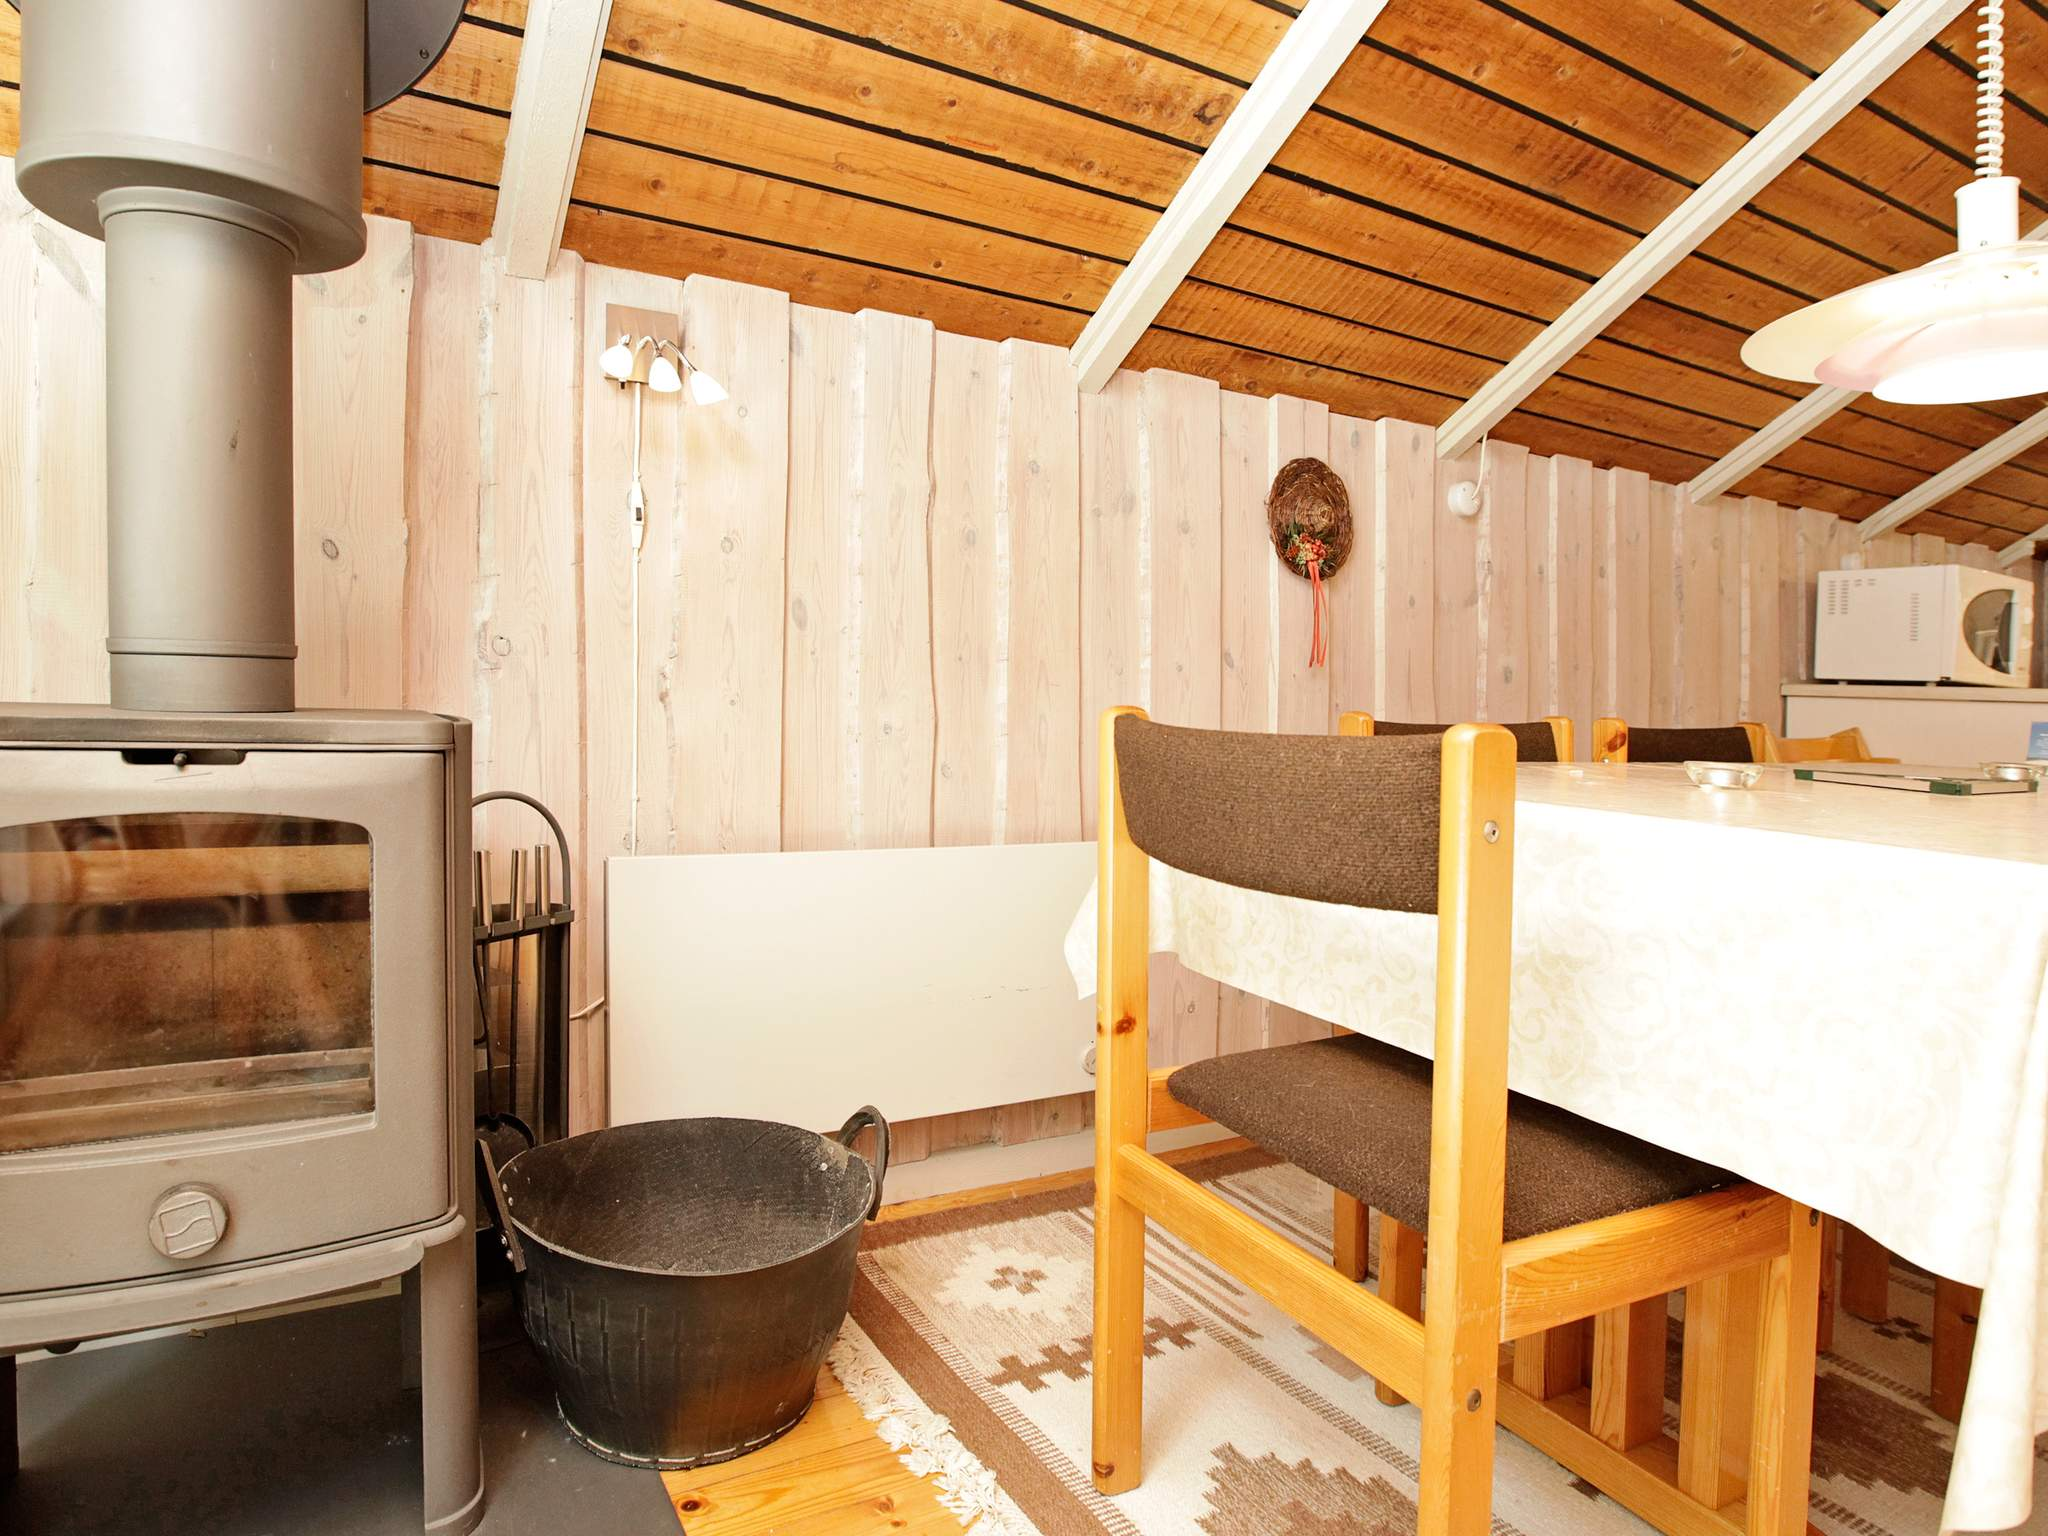 Ferienhaus Ristinge (82427), Ristinge, , Langeland, Dänemark, Bild 5